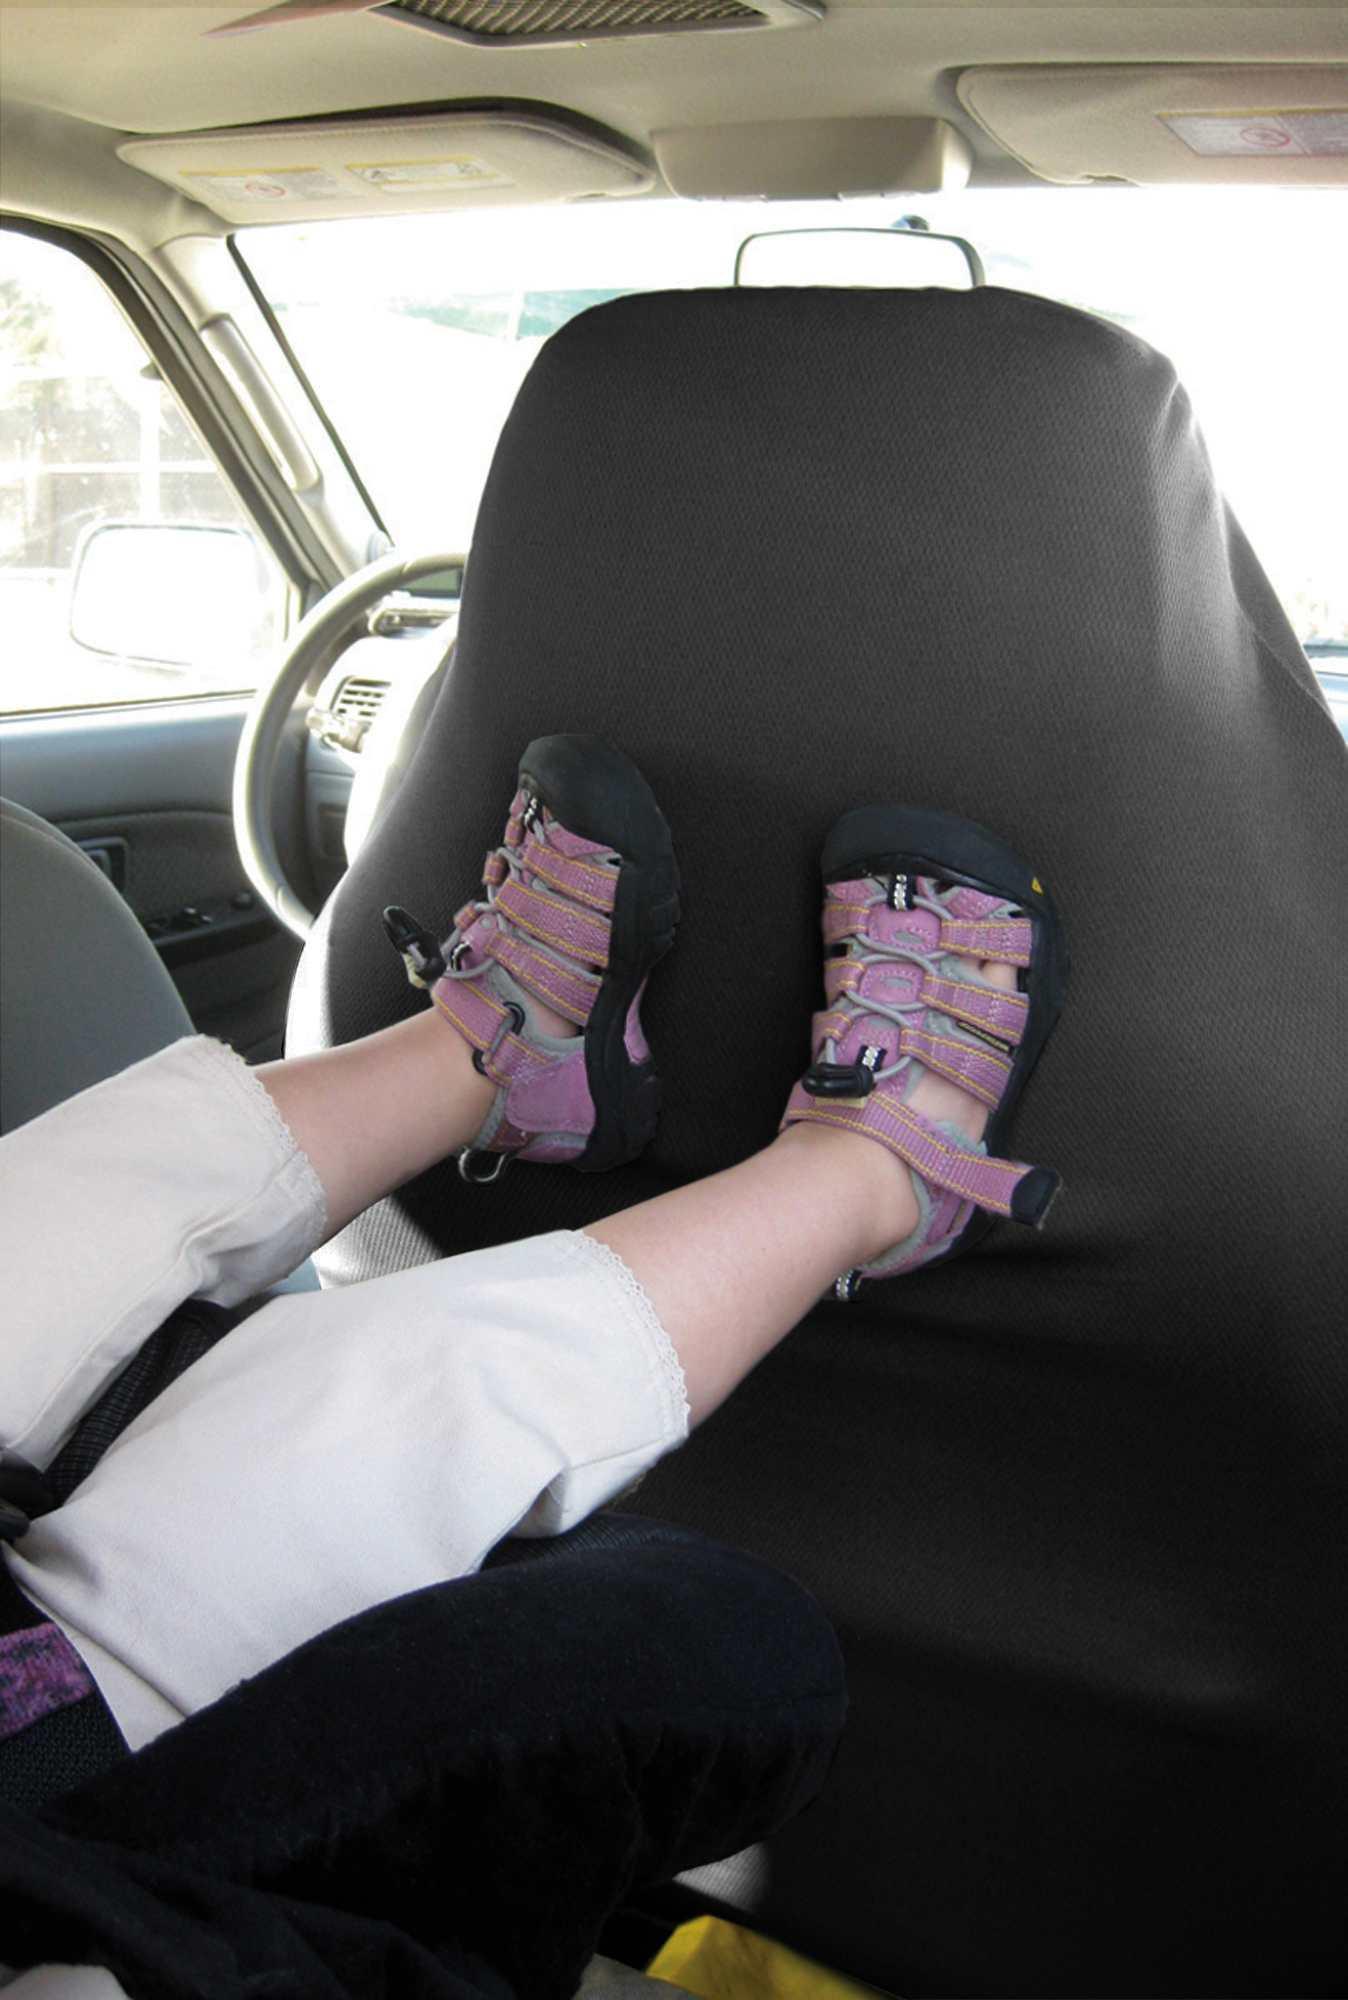 Kurgo Bucket Seat Covers Keep Back of Seats Clean